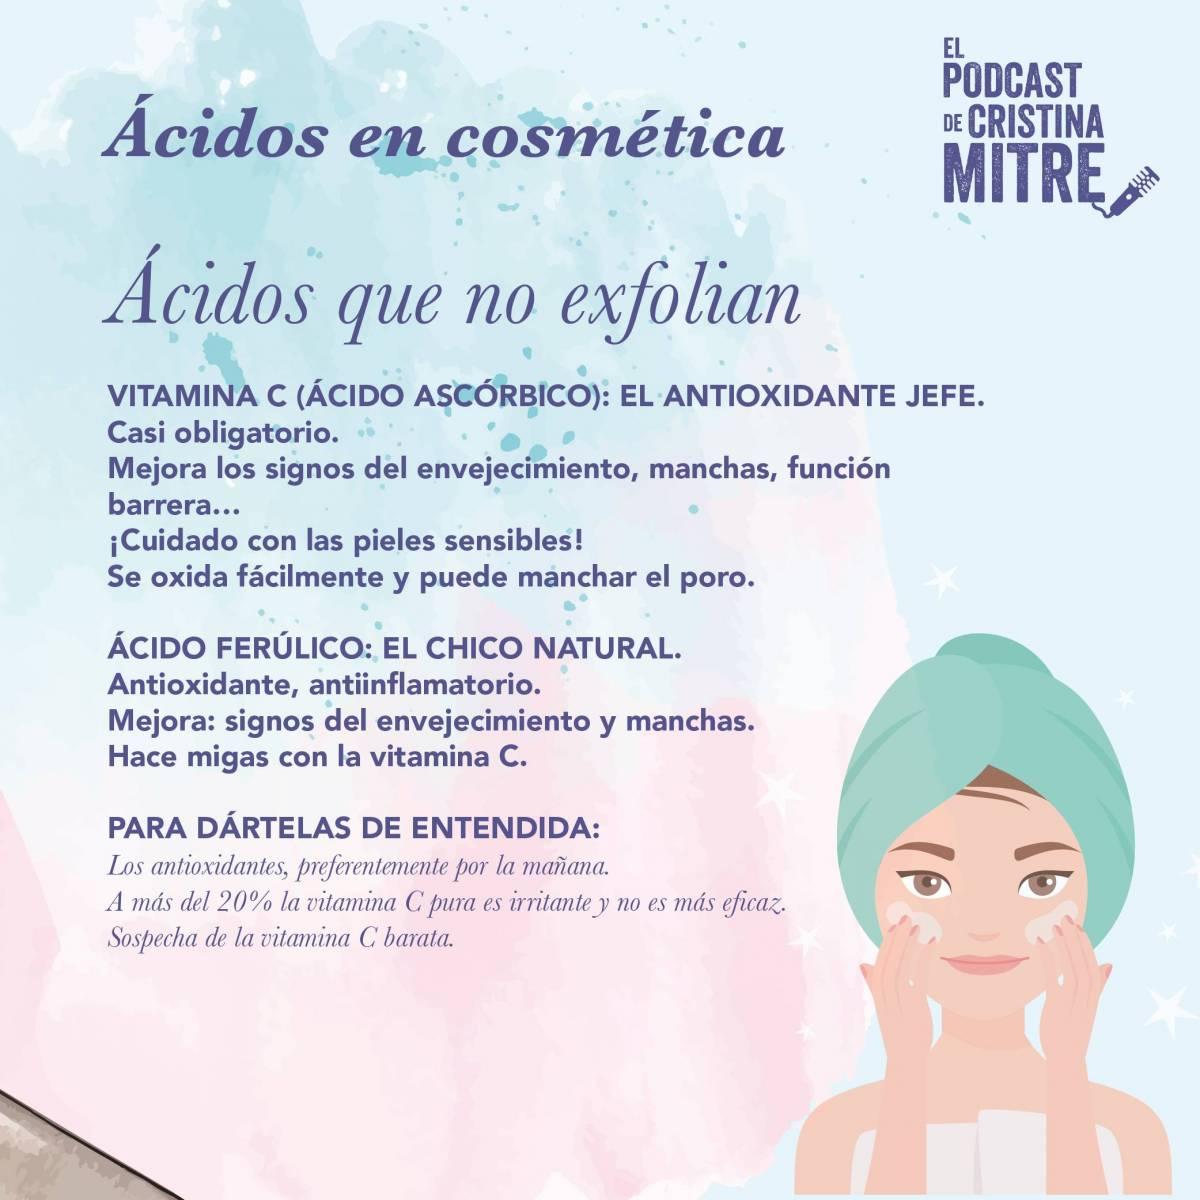 ácidos cosméticos